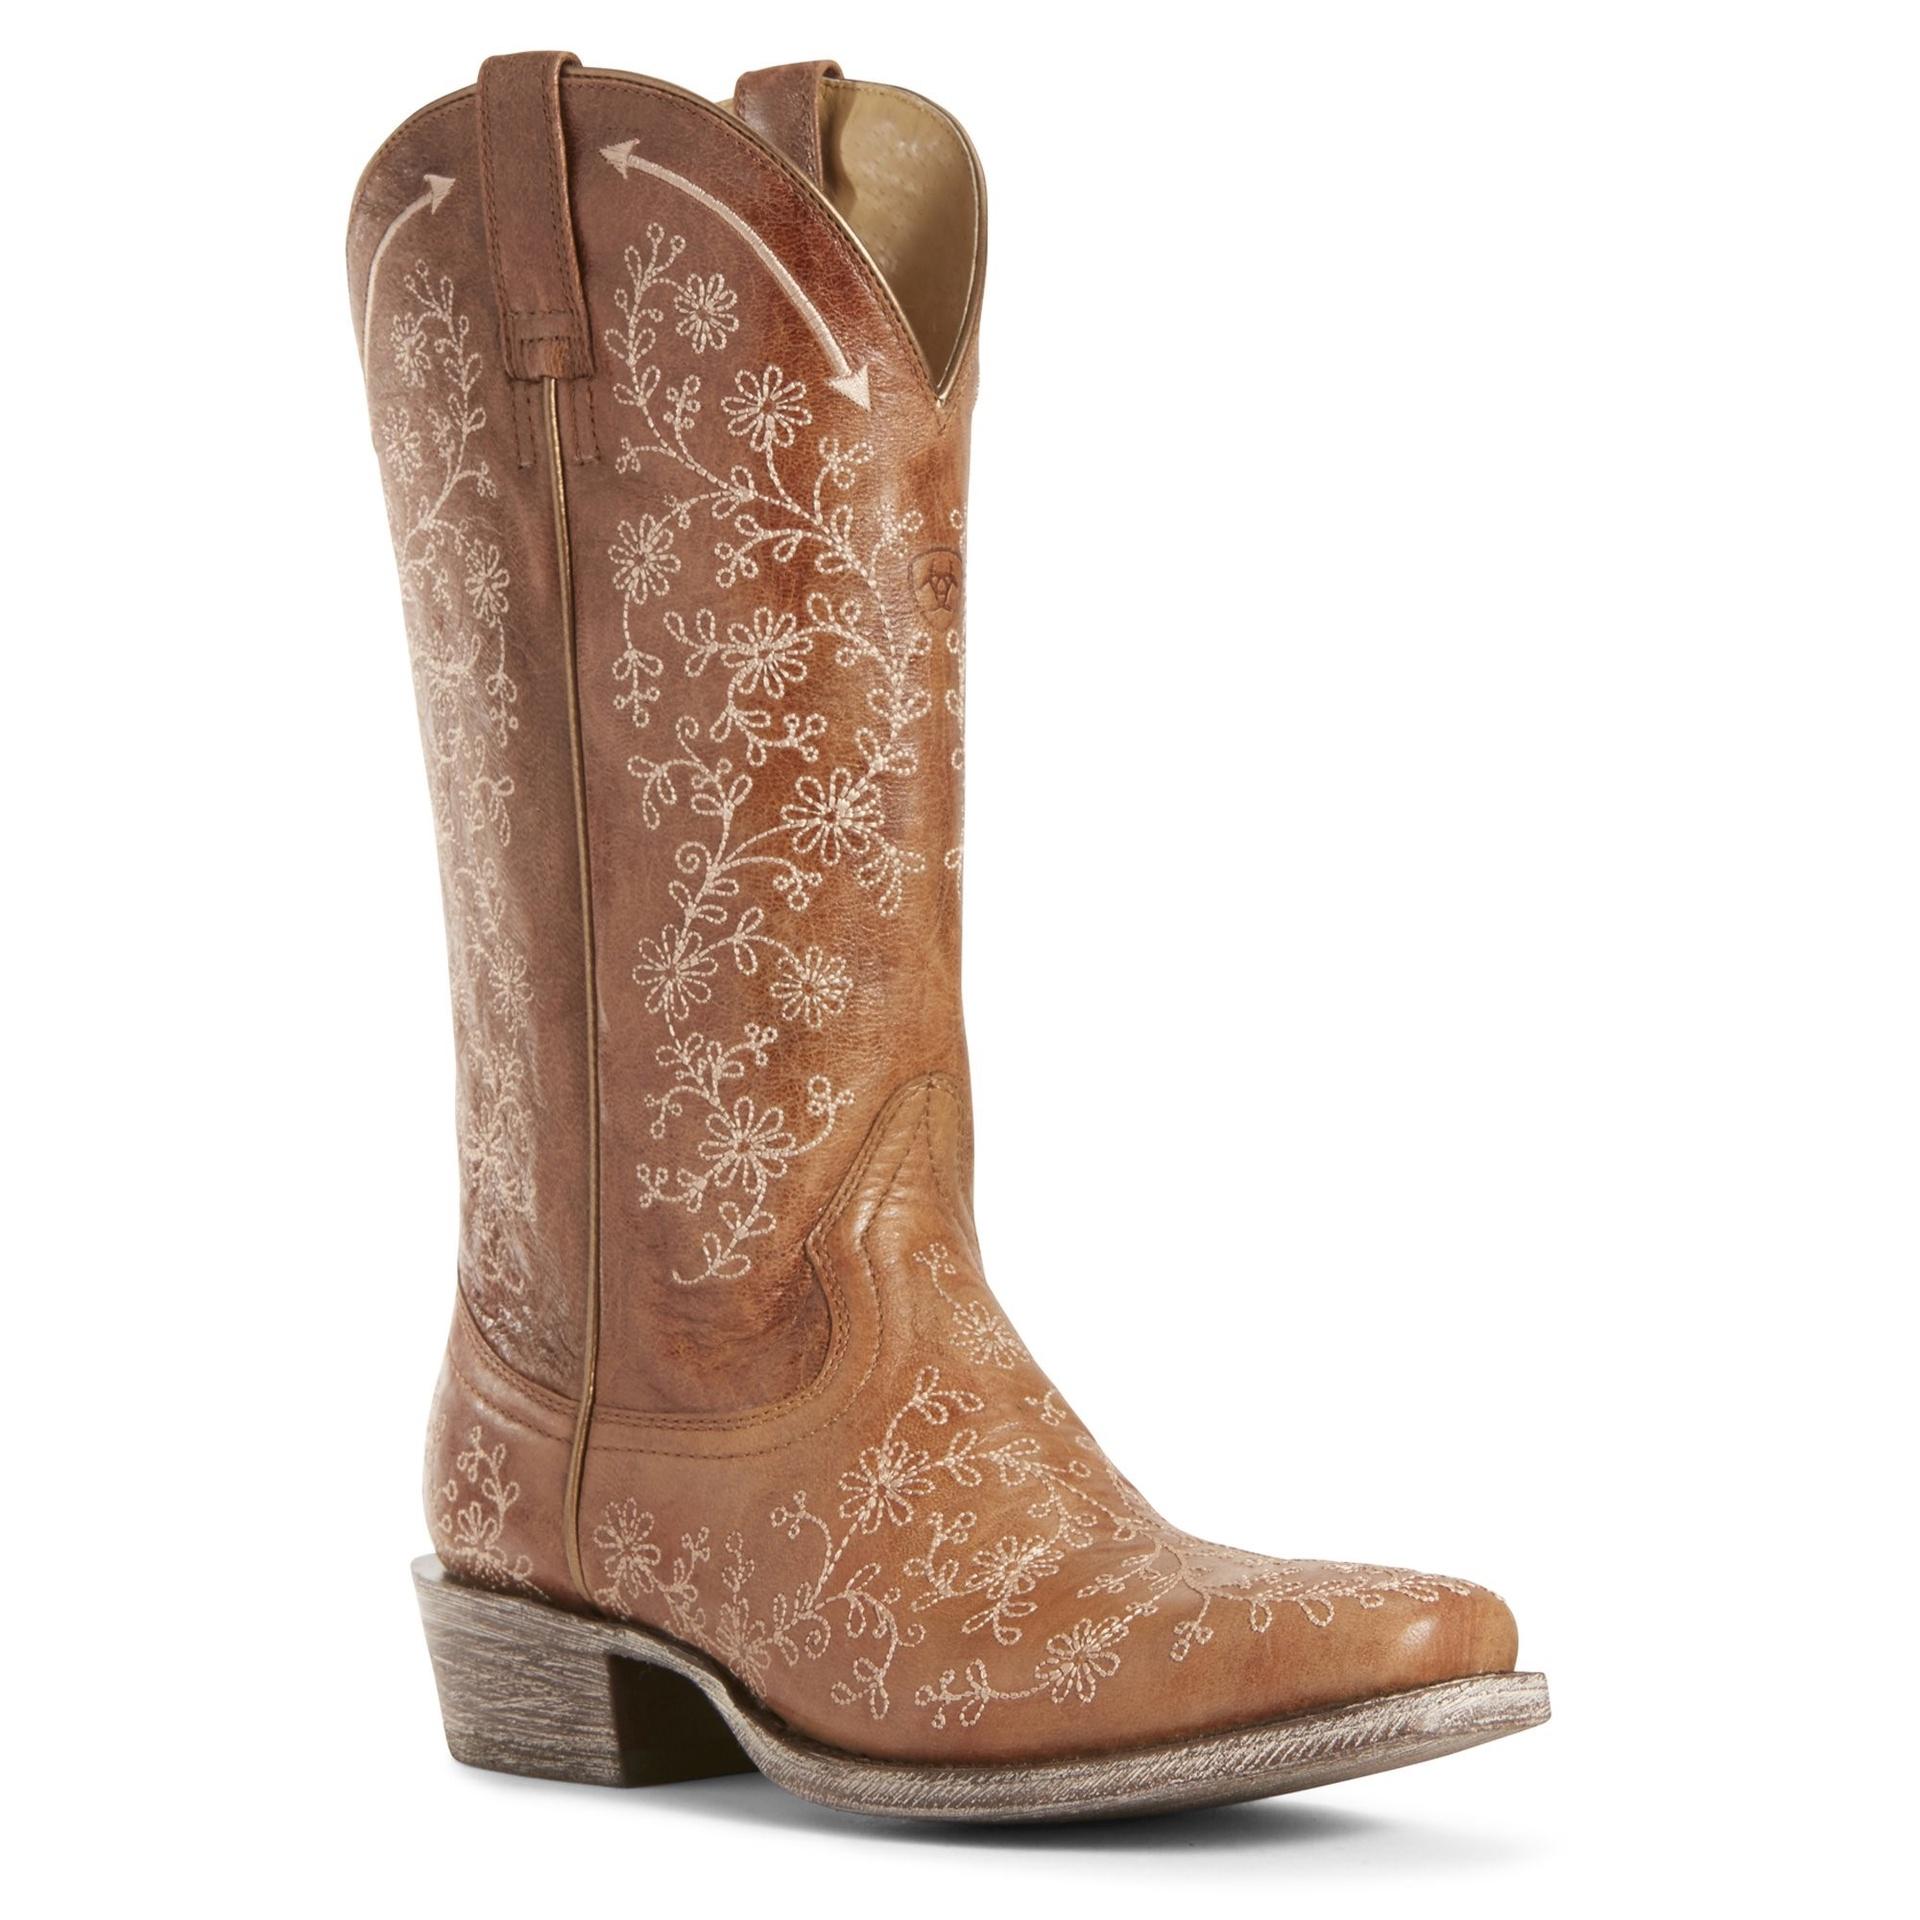 Ariat Women's Boots 'Fleur' Cashew With